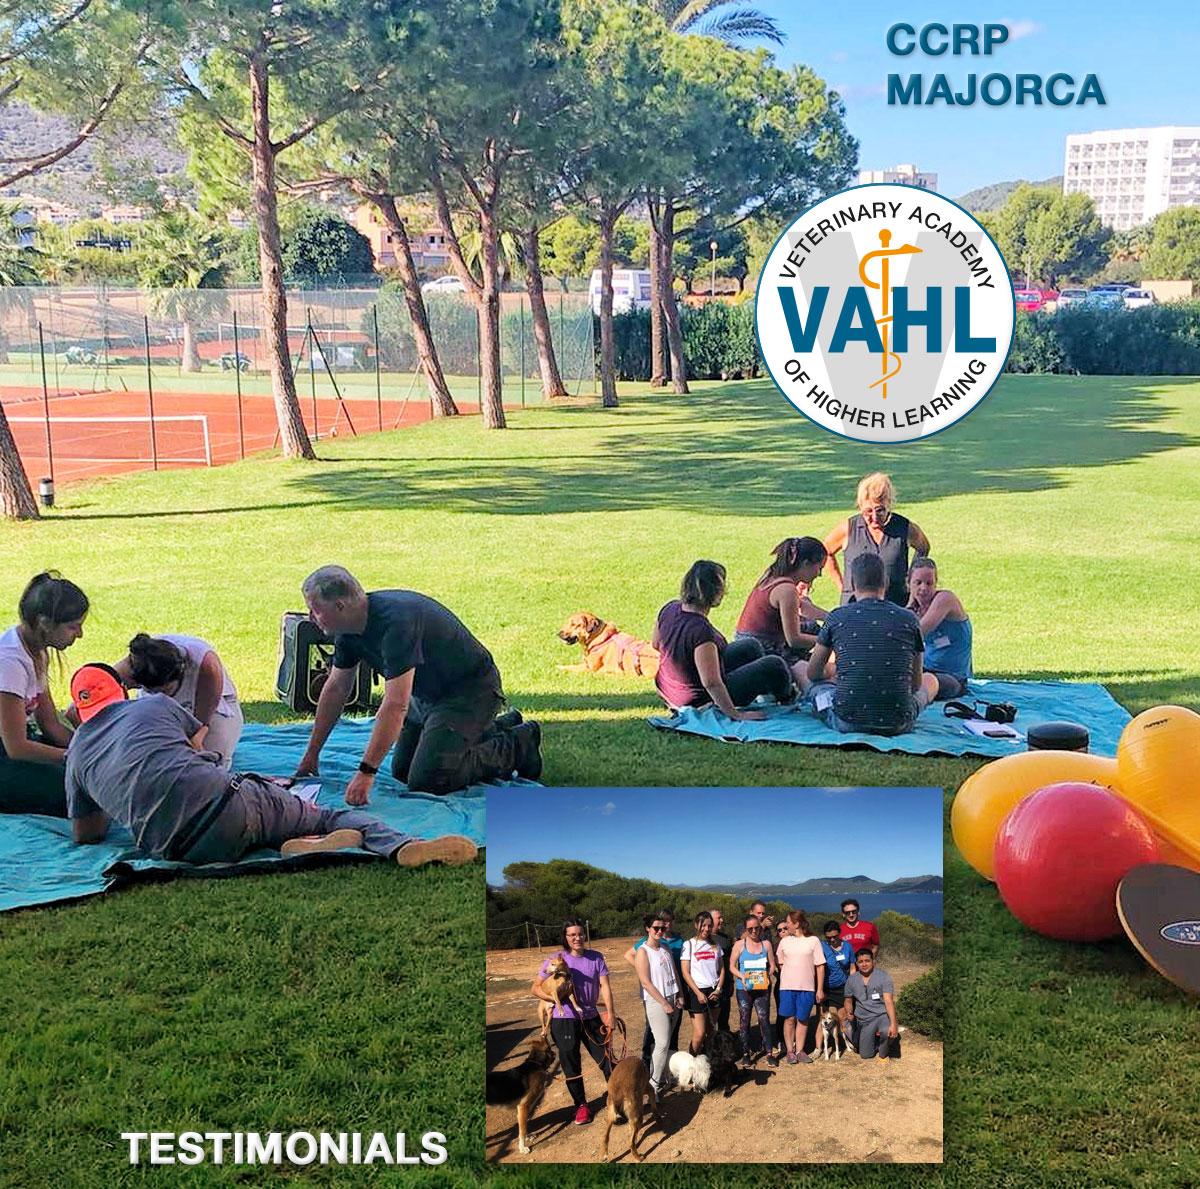 CCRP by VAHL - Majorca 2019 - Testimonials